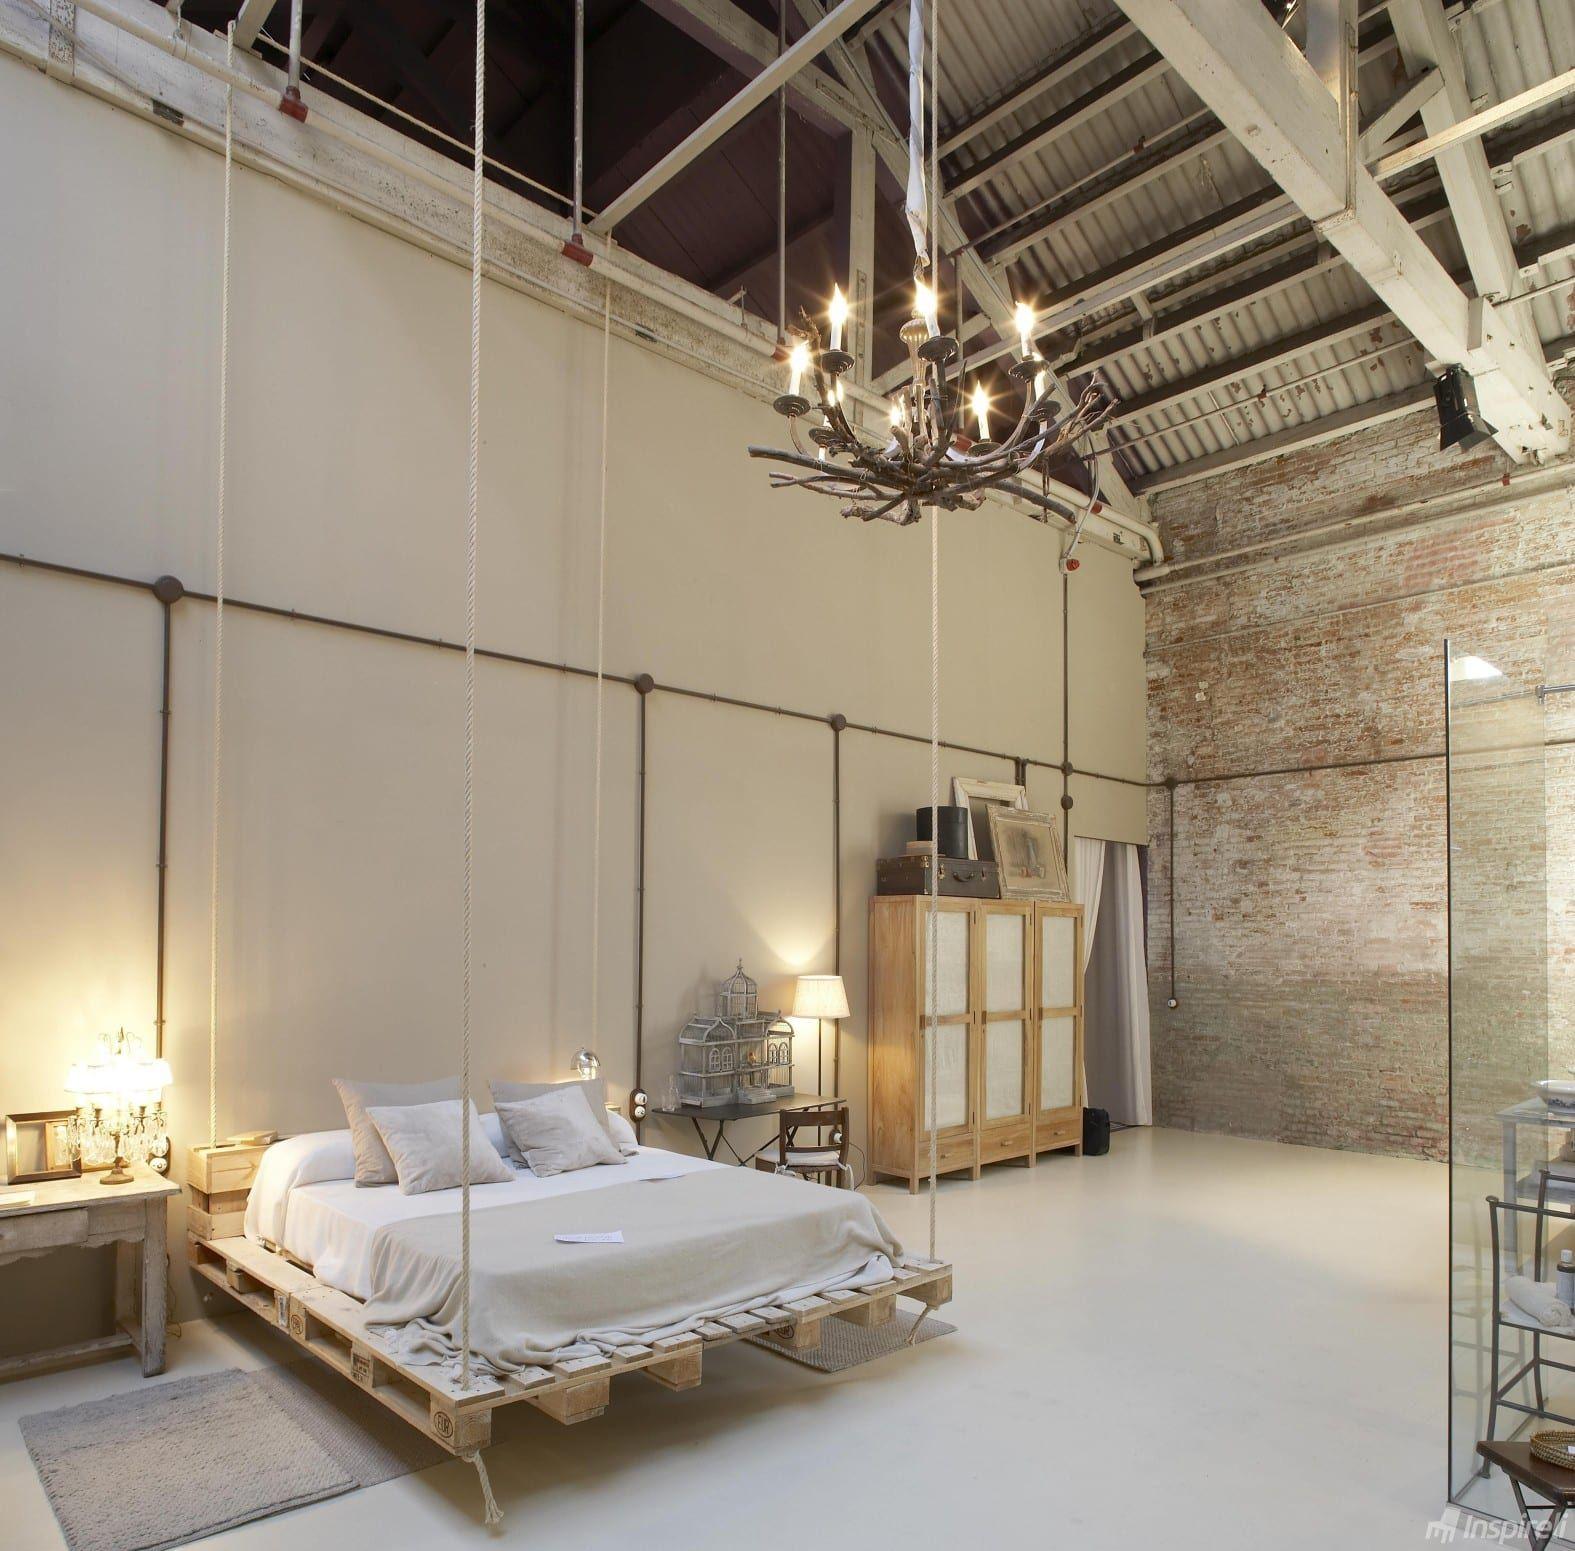 Cama colgante | camas | Pinterest | Camas colgantes, Palets y Camas